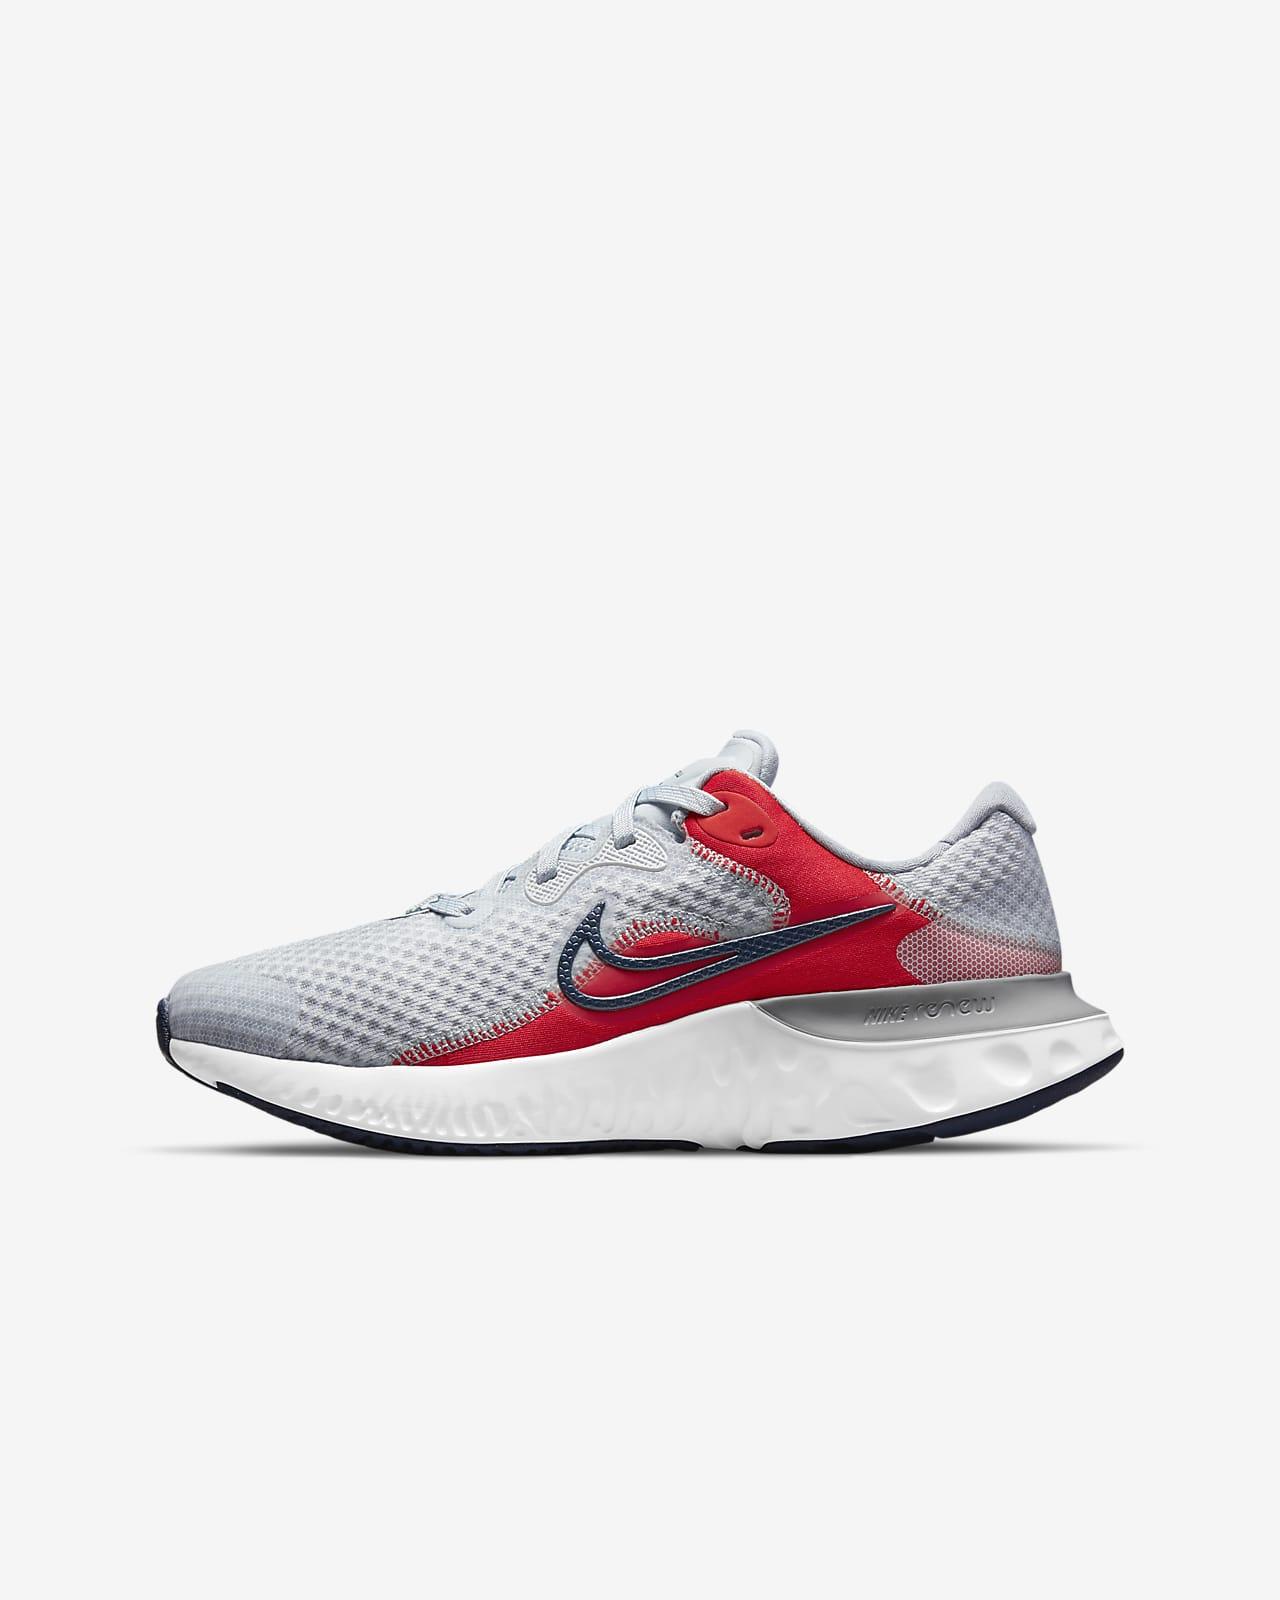 Calzado de running para carretera para niños talla grande Nike Renew Run 2